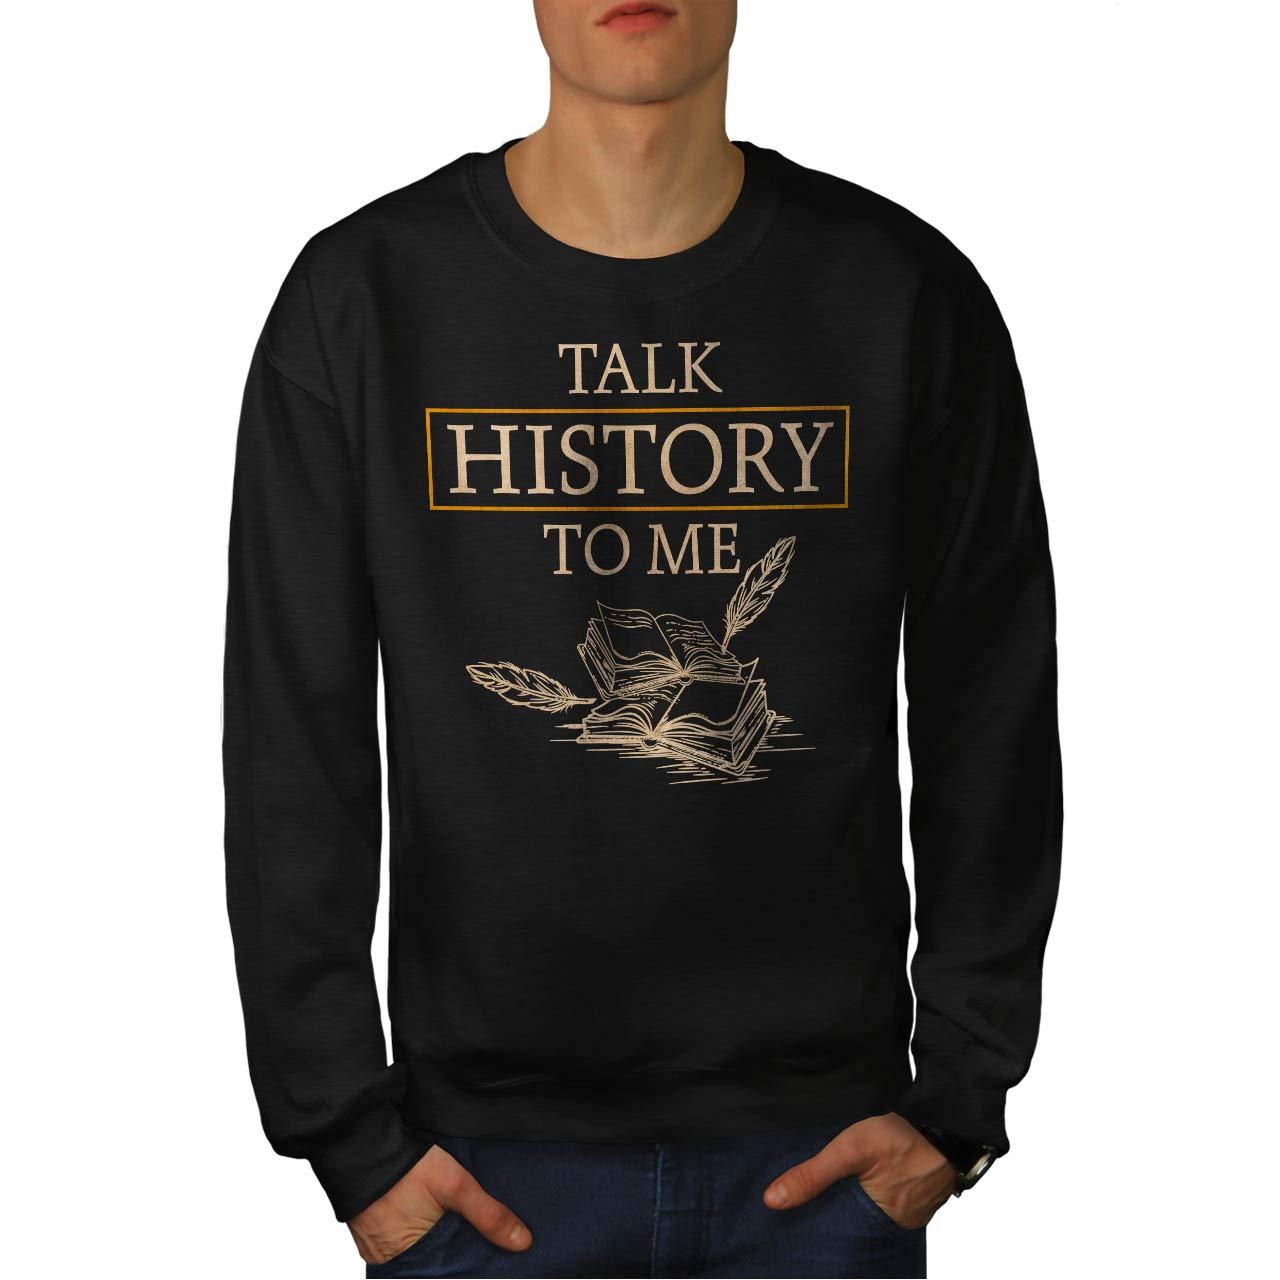 Wellcoda Talk History Mens Sweatshirt, Historian Books Top Pullover Jumper